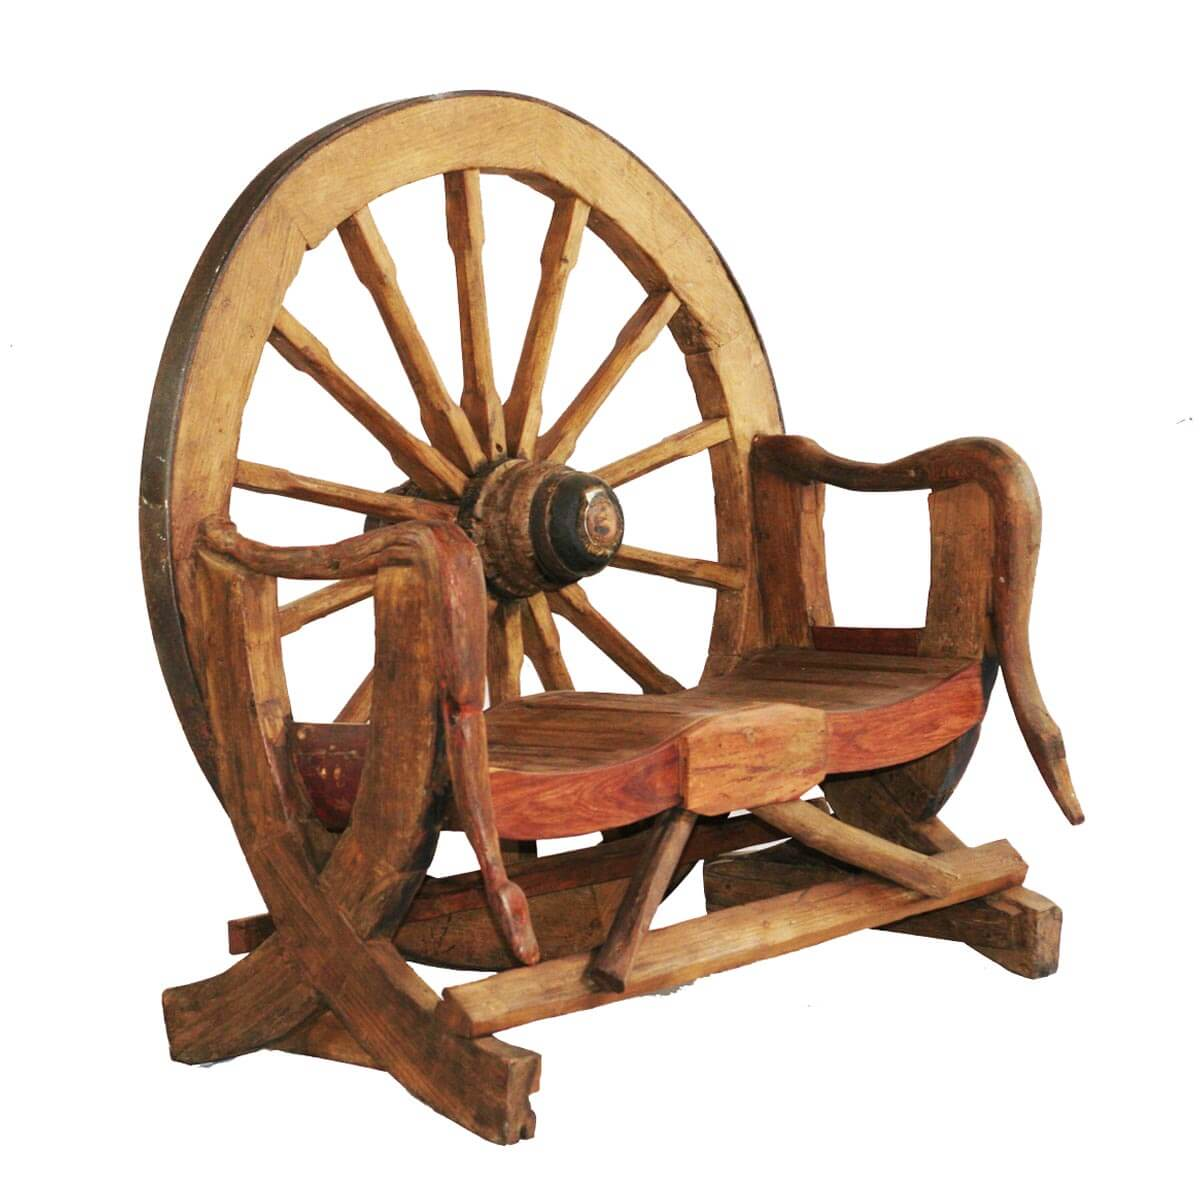 Wagon Wheel Teak Wood Novelty Garden Bench